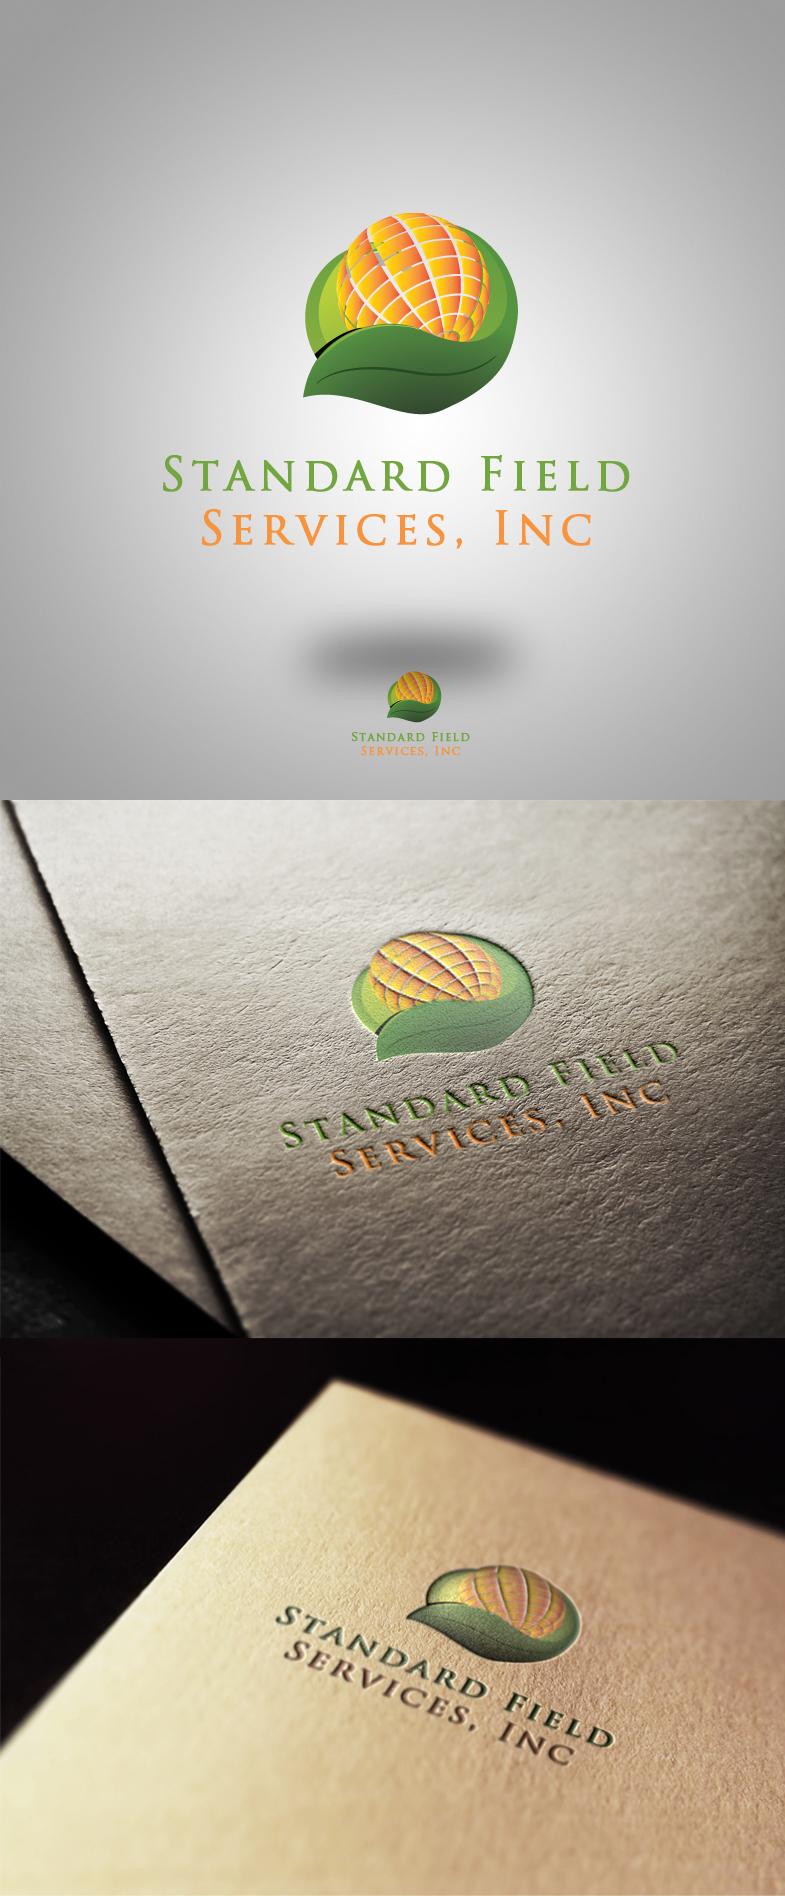 Logo Design by Dmitriy Belyaev - Entry No. 30 in the Logo Design Contest Inspiring Logo Design for Standard Field Services, Inc..